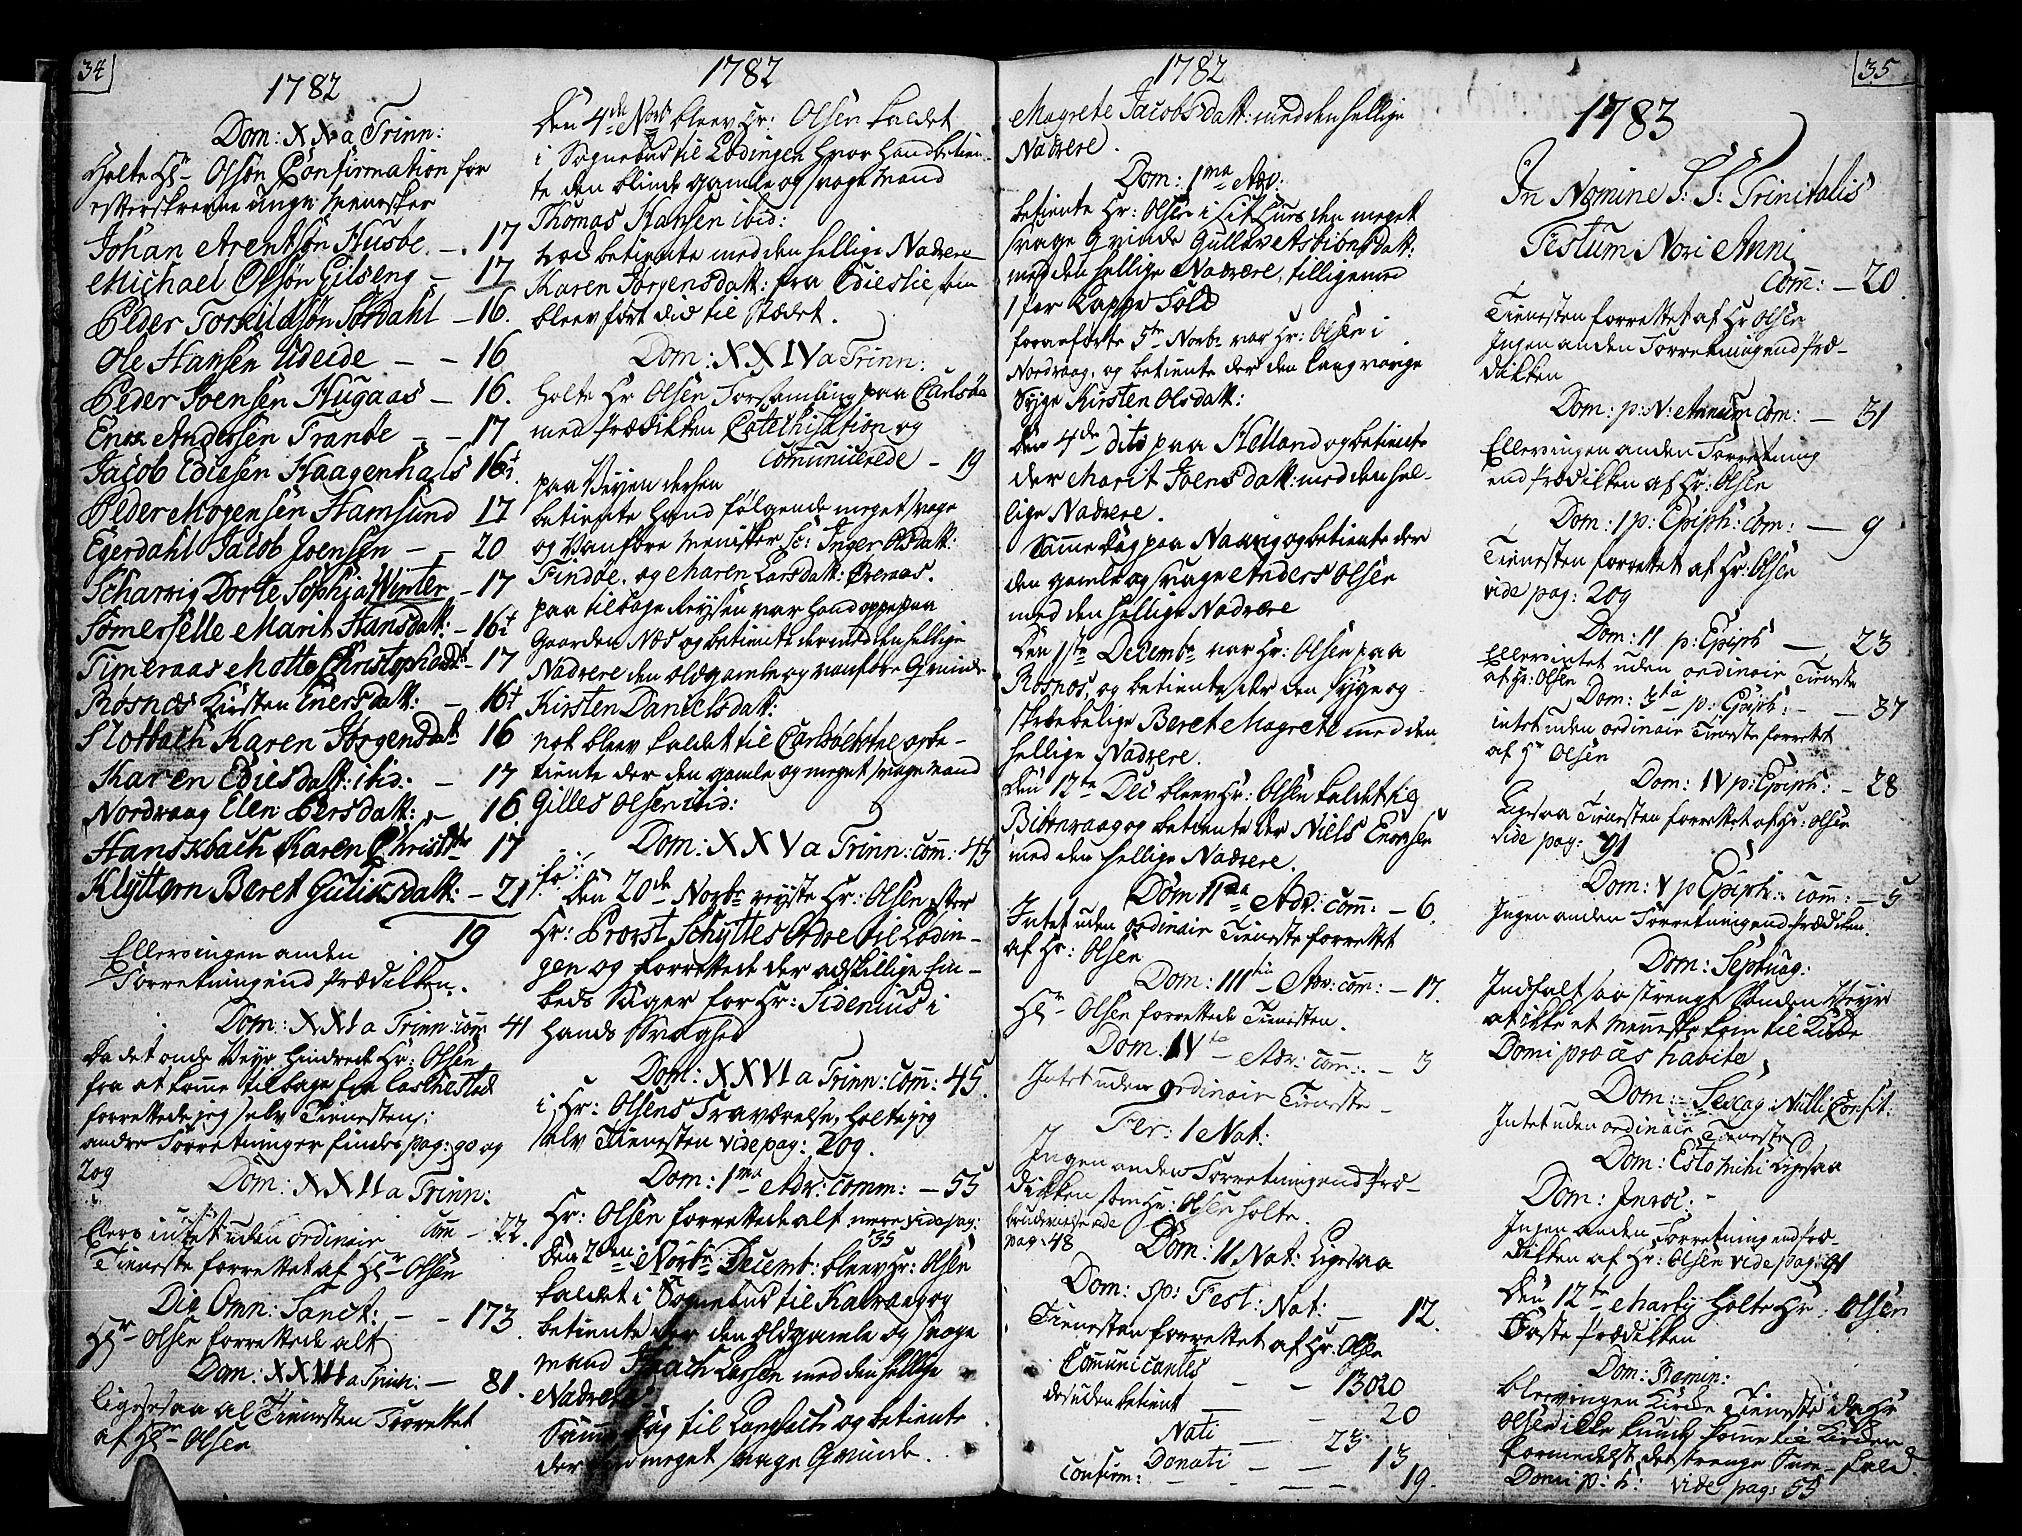 SAT, Ministerialprotokoller, klokkerbøker og fødselsregistre - Nordland, 859/L0841: Ministerialbok nr. 859A01, 1766-1821, s. 34-35